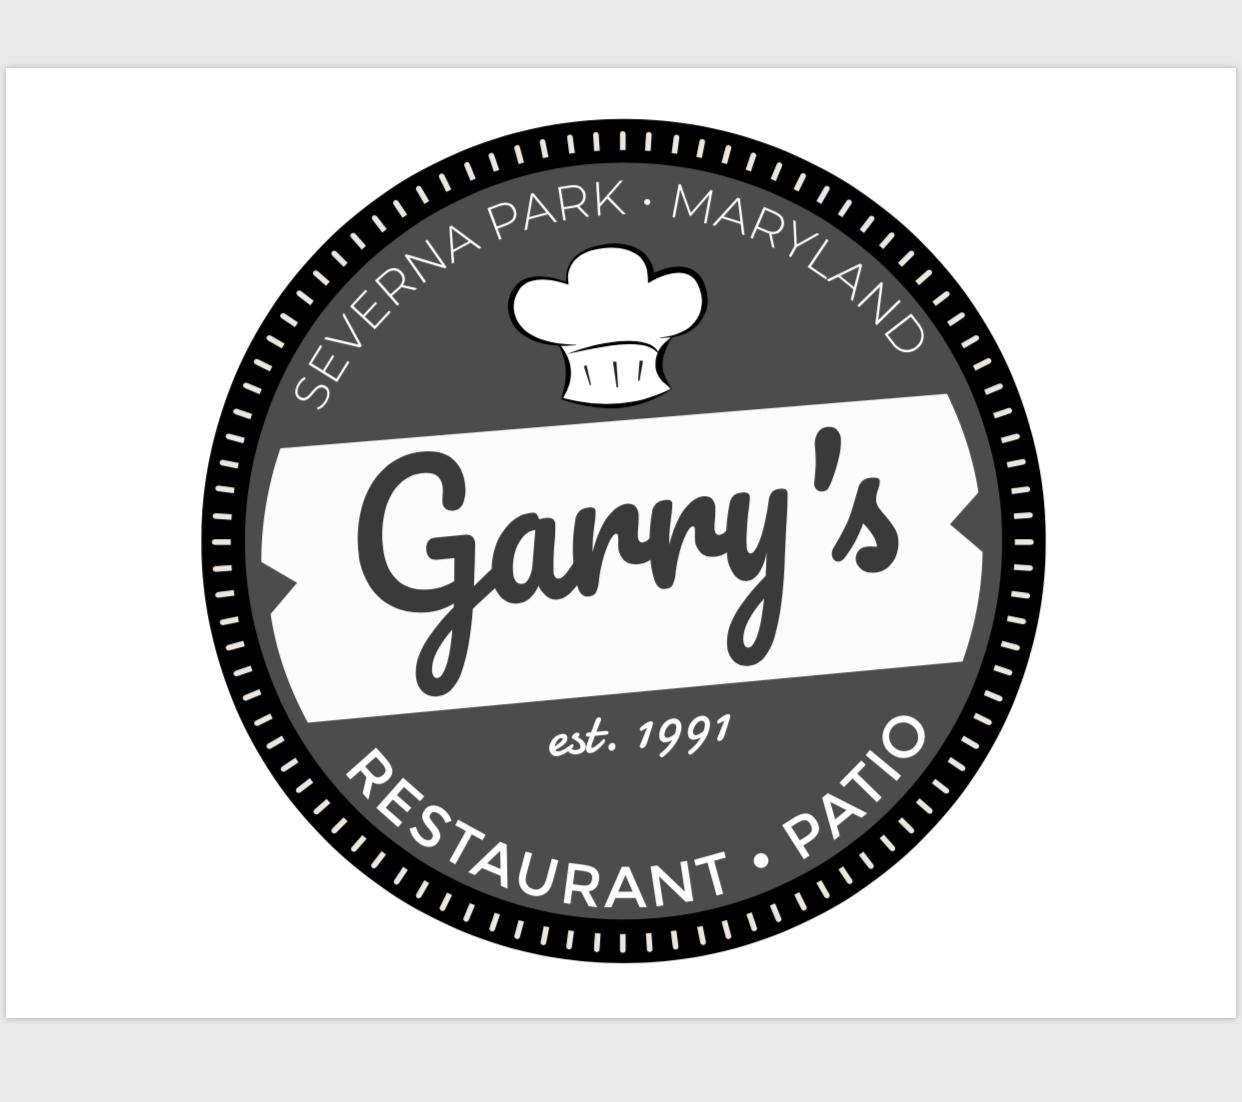 Garry's Grill